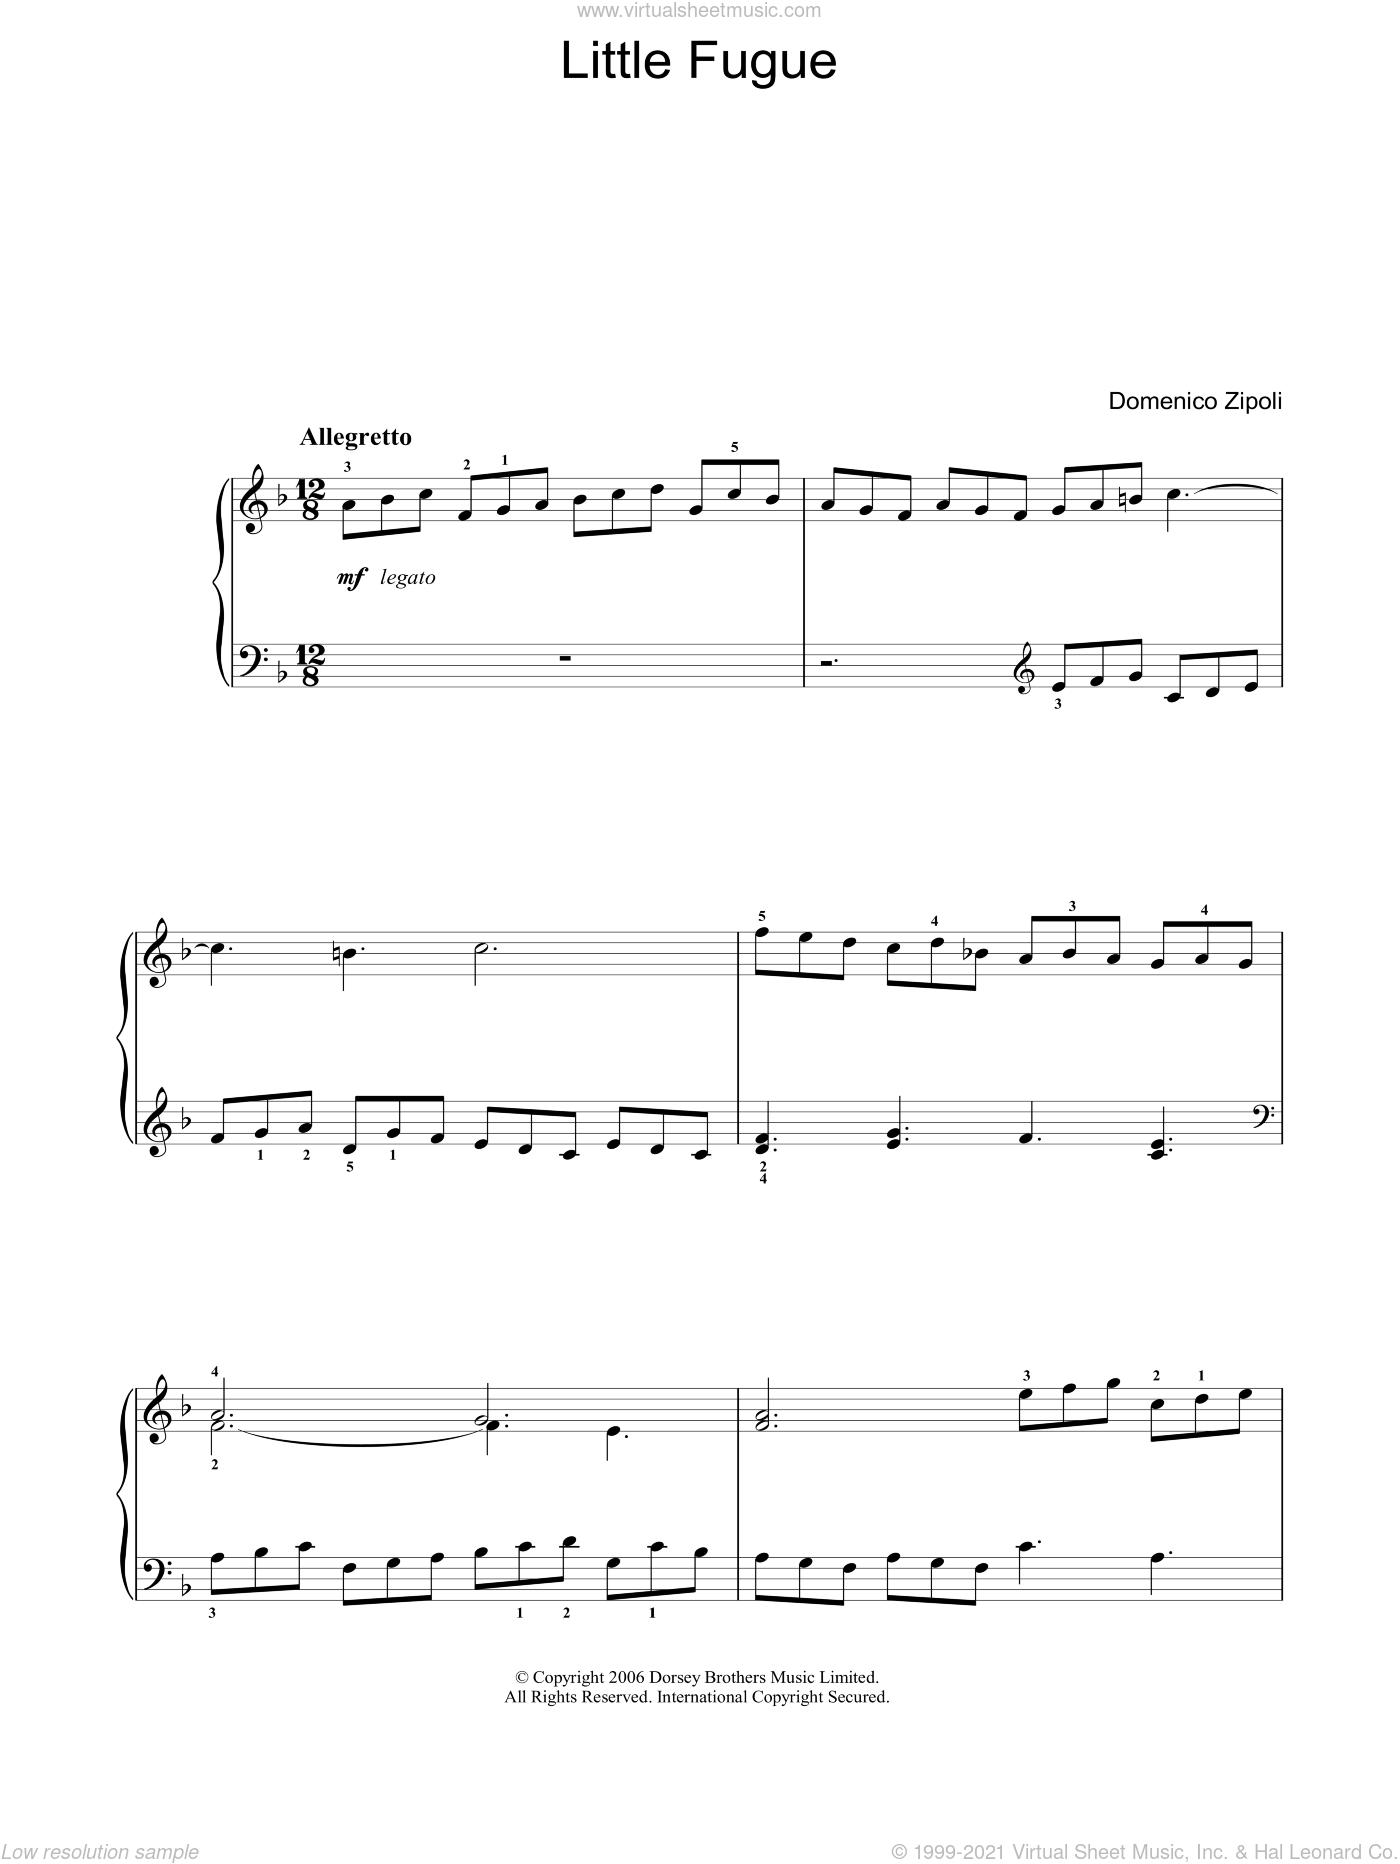 Little Fugue sheet music for voice, piano or guitar by Domenico Zipoli, classical score, intermediate skill level